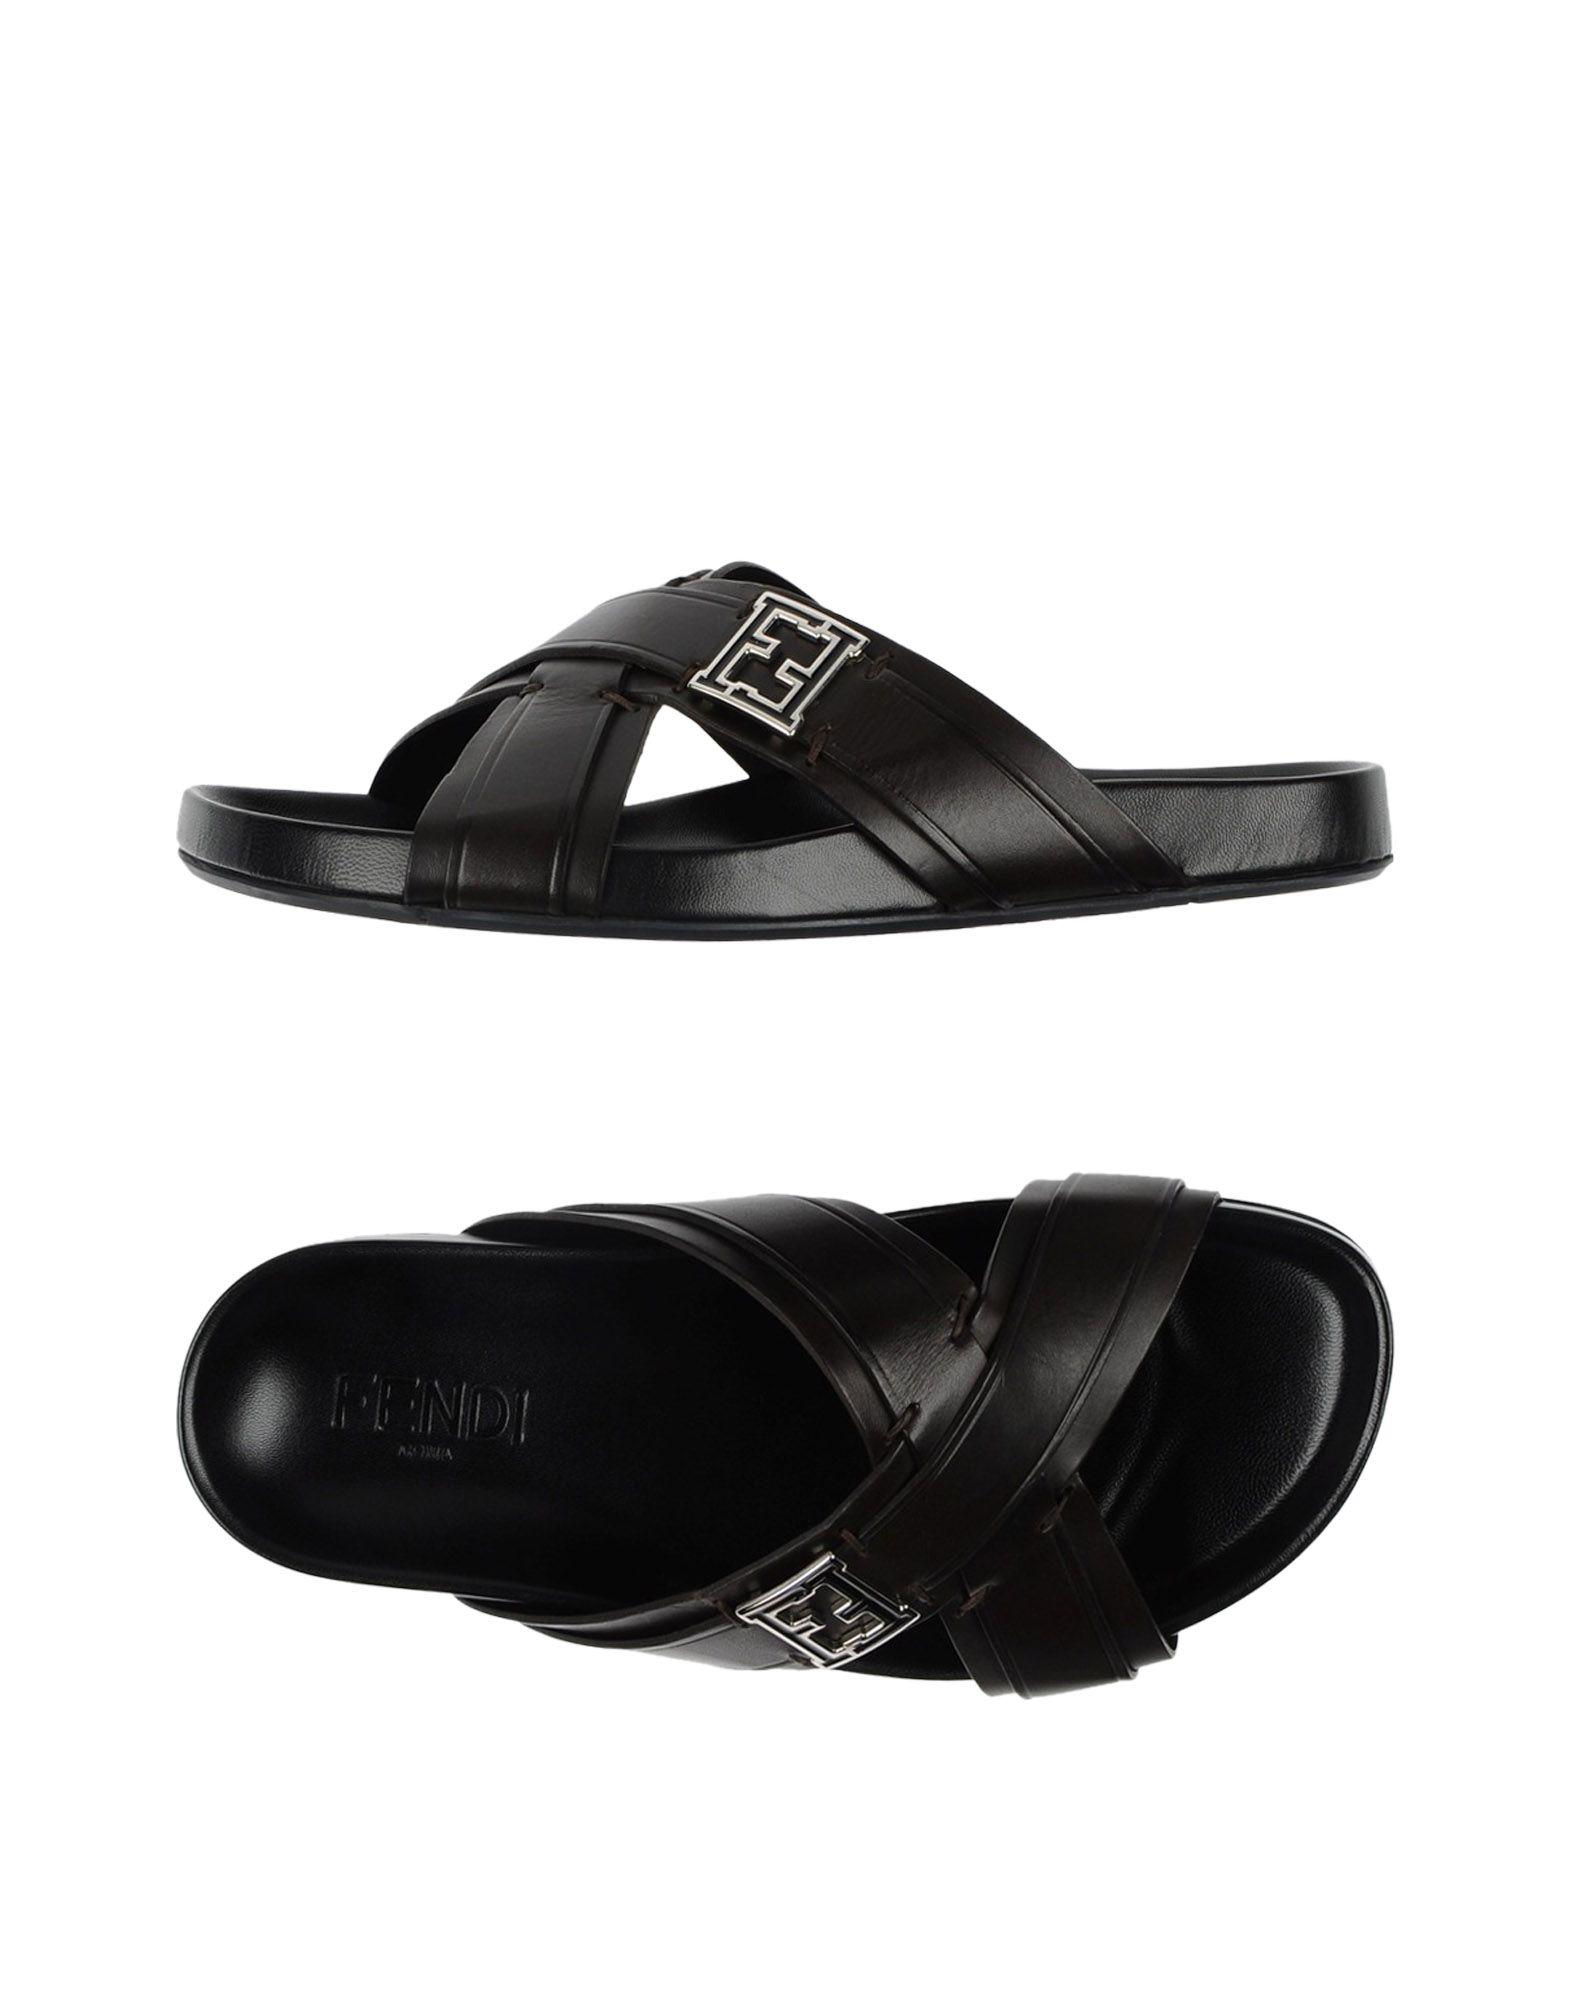 a266ac3fb70791 Lyst - Fendi Sandals in Brown for Men